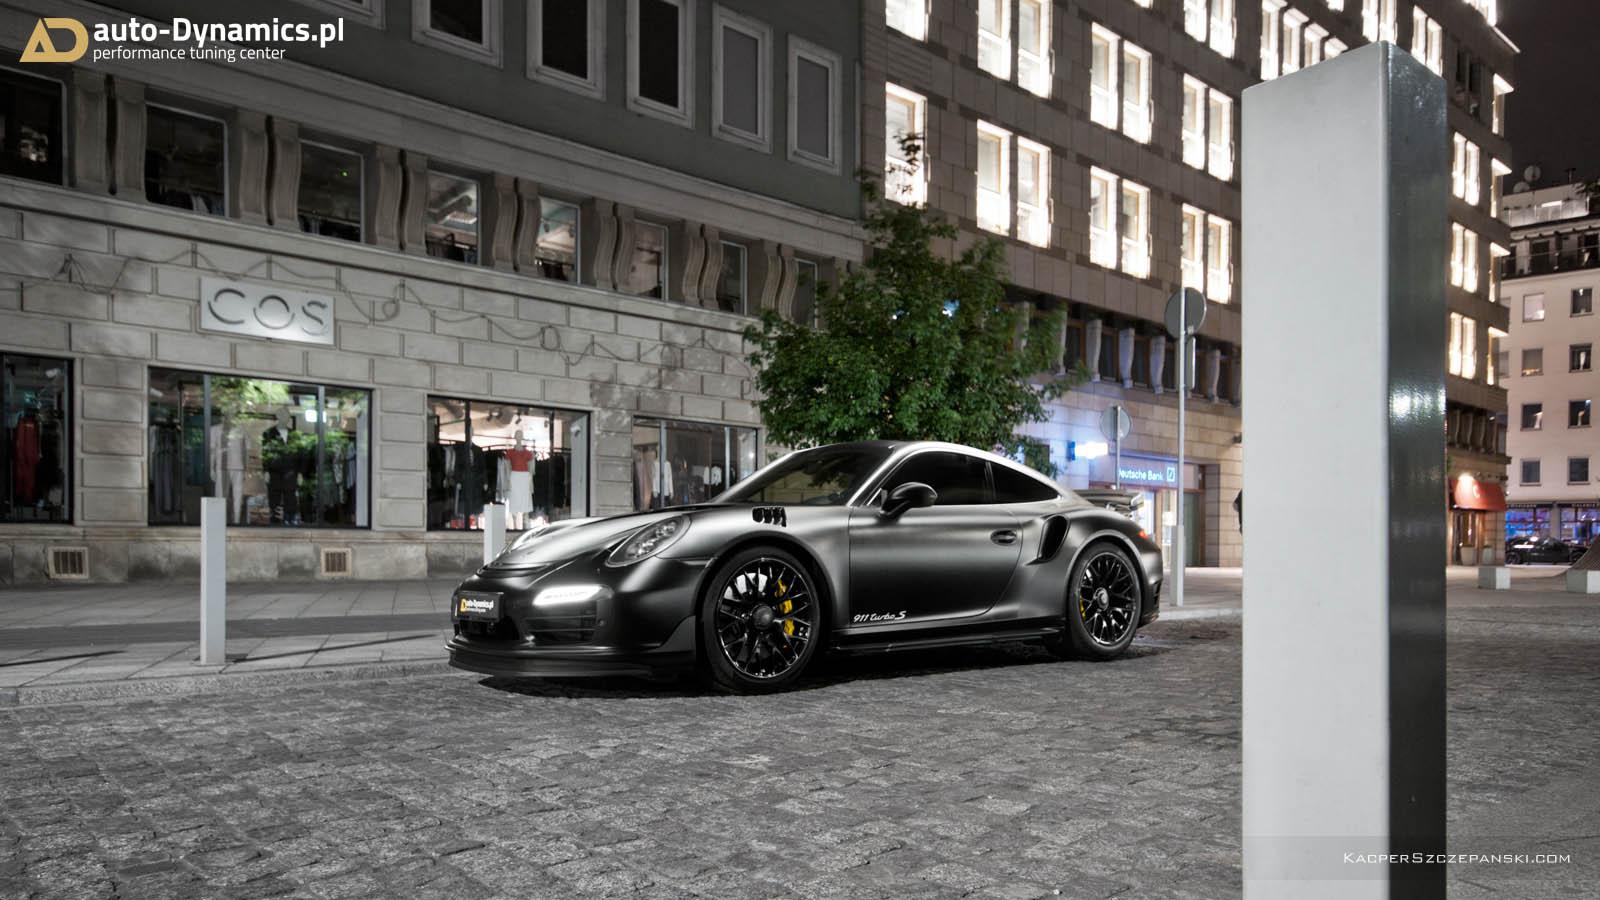 Porsche 911 Turbo S by Auto-Dynamics (1)